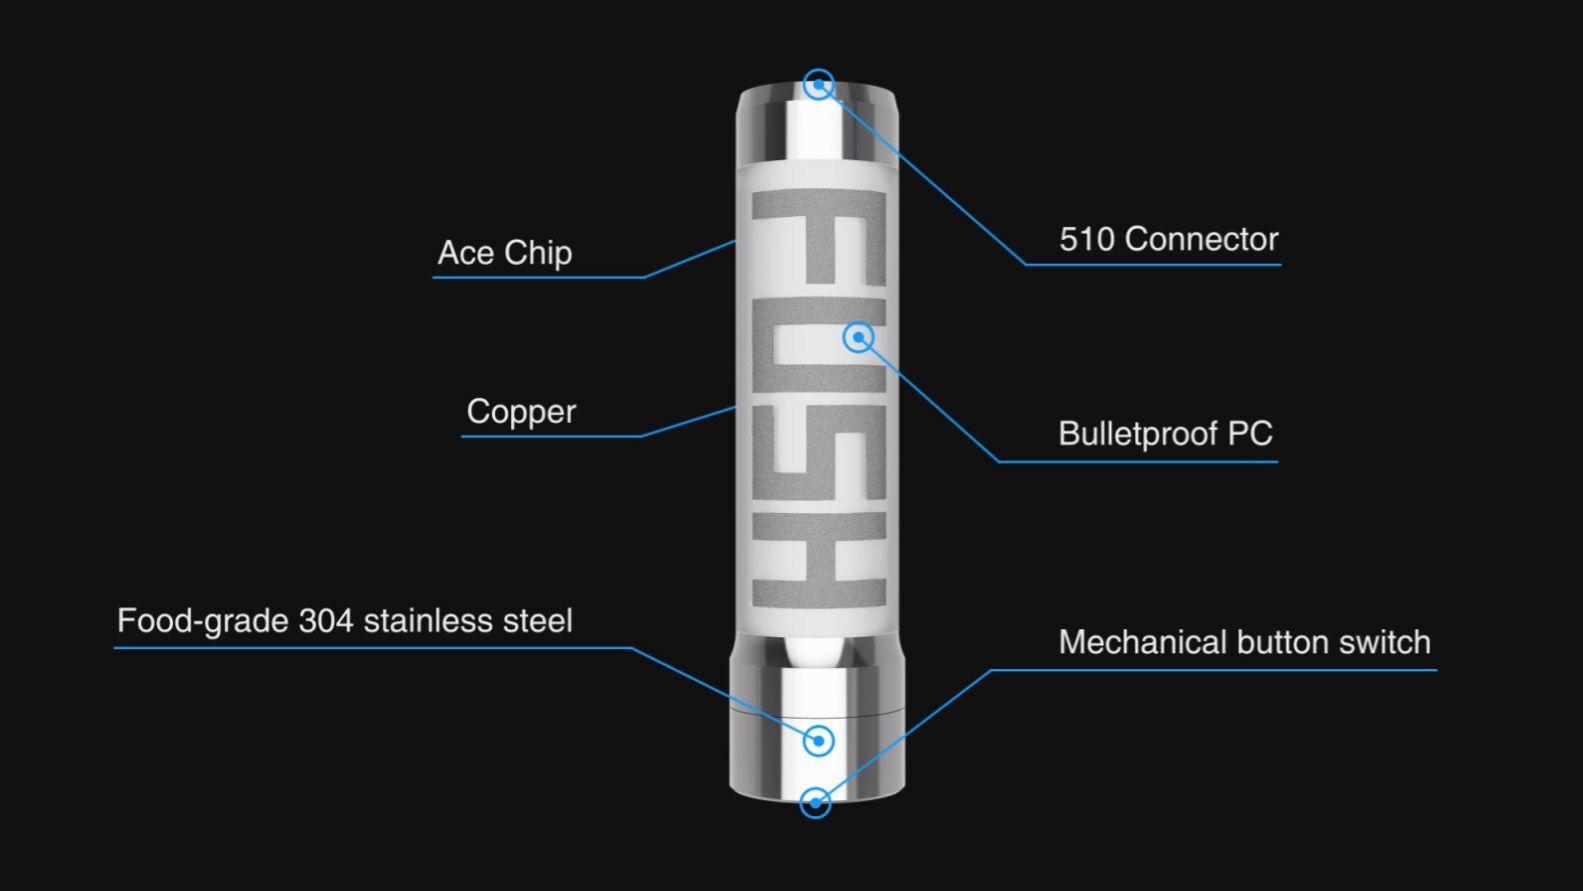 acrohm-fush-semi-mechanical-mod-components-rundown-ace-chip-copper-tube-stainless-steel-bulletproof-polycarbonate